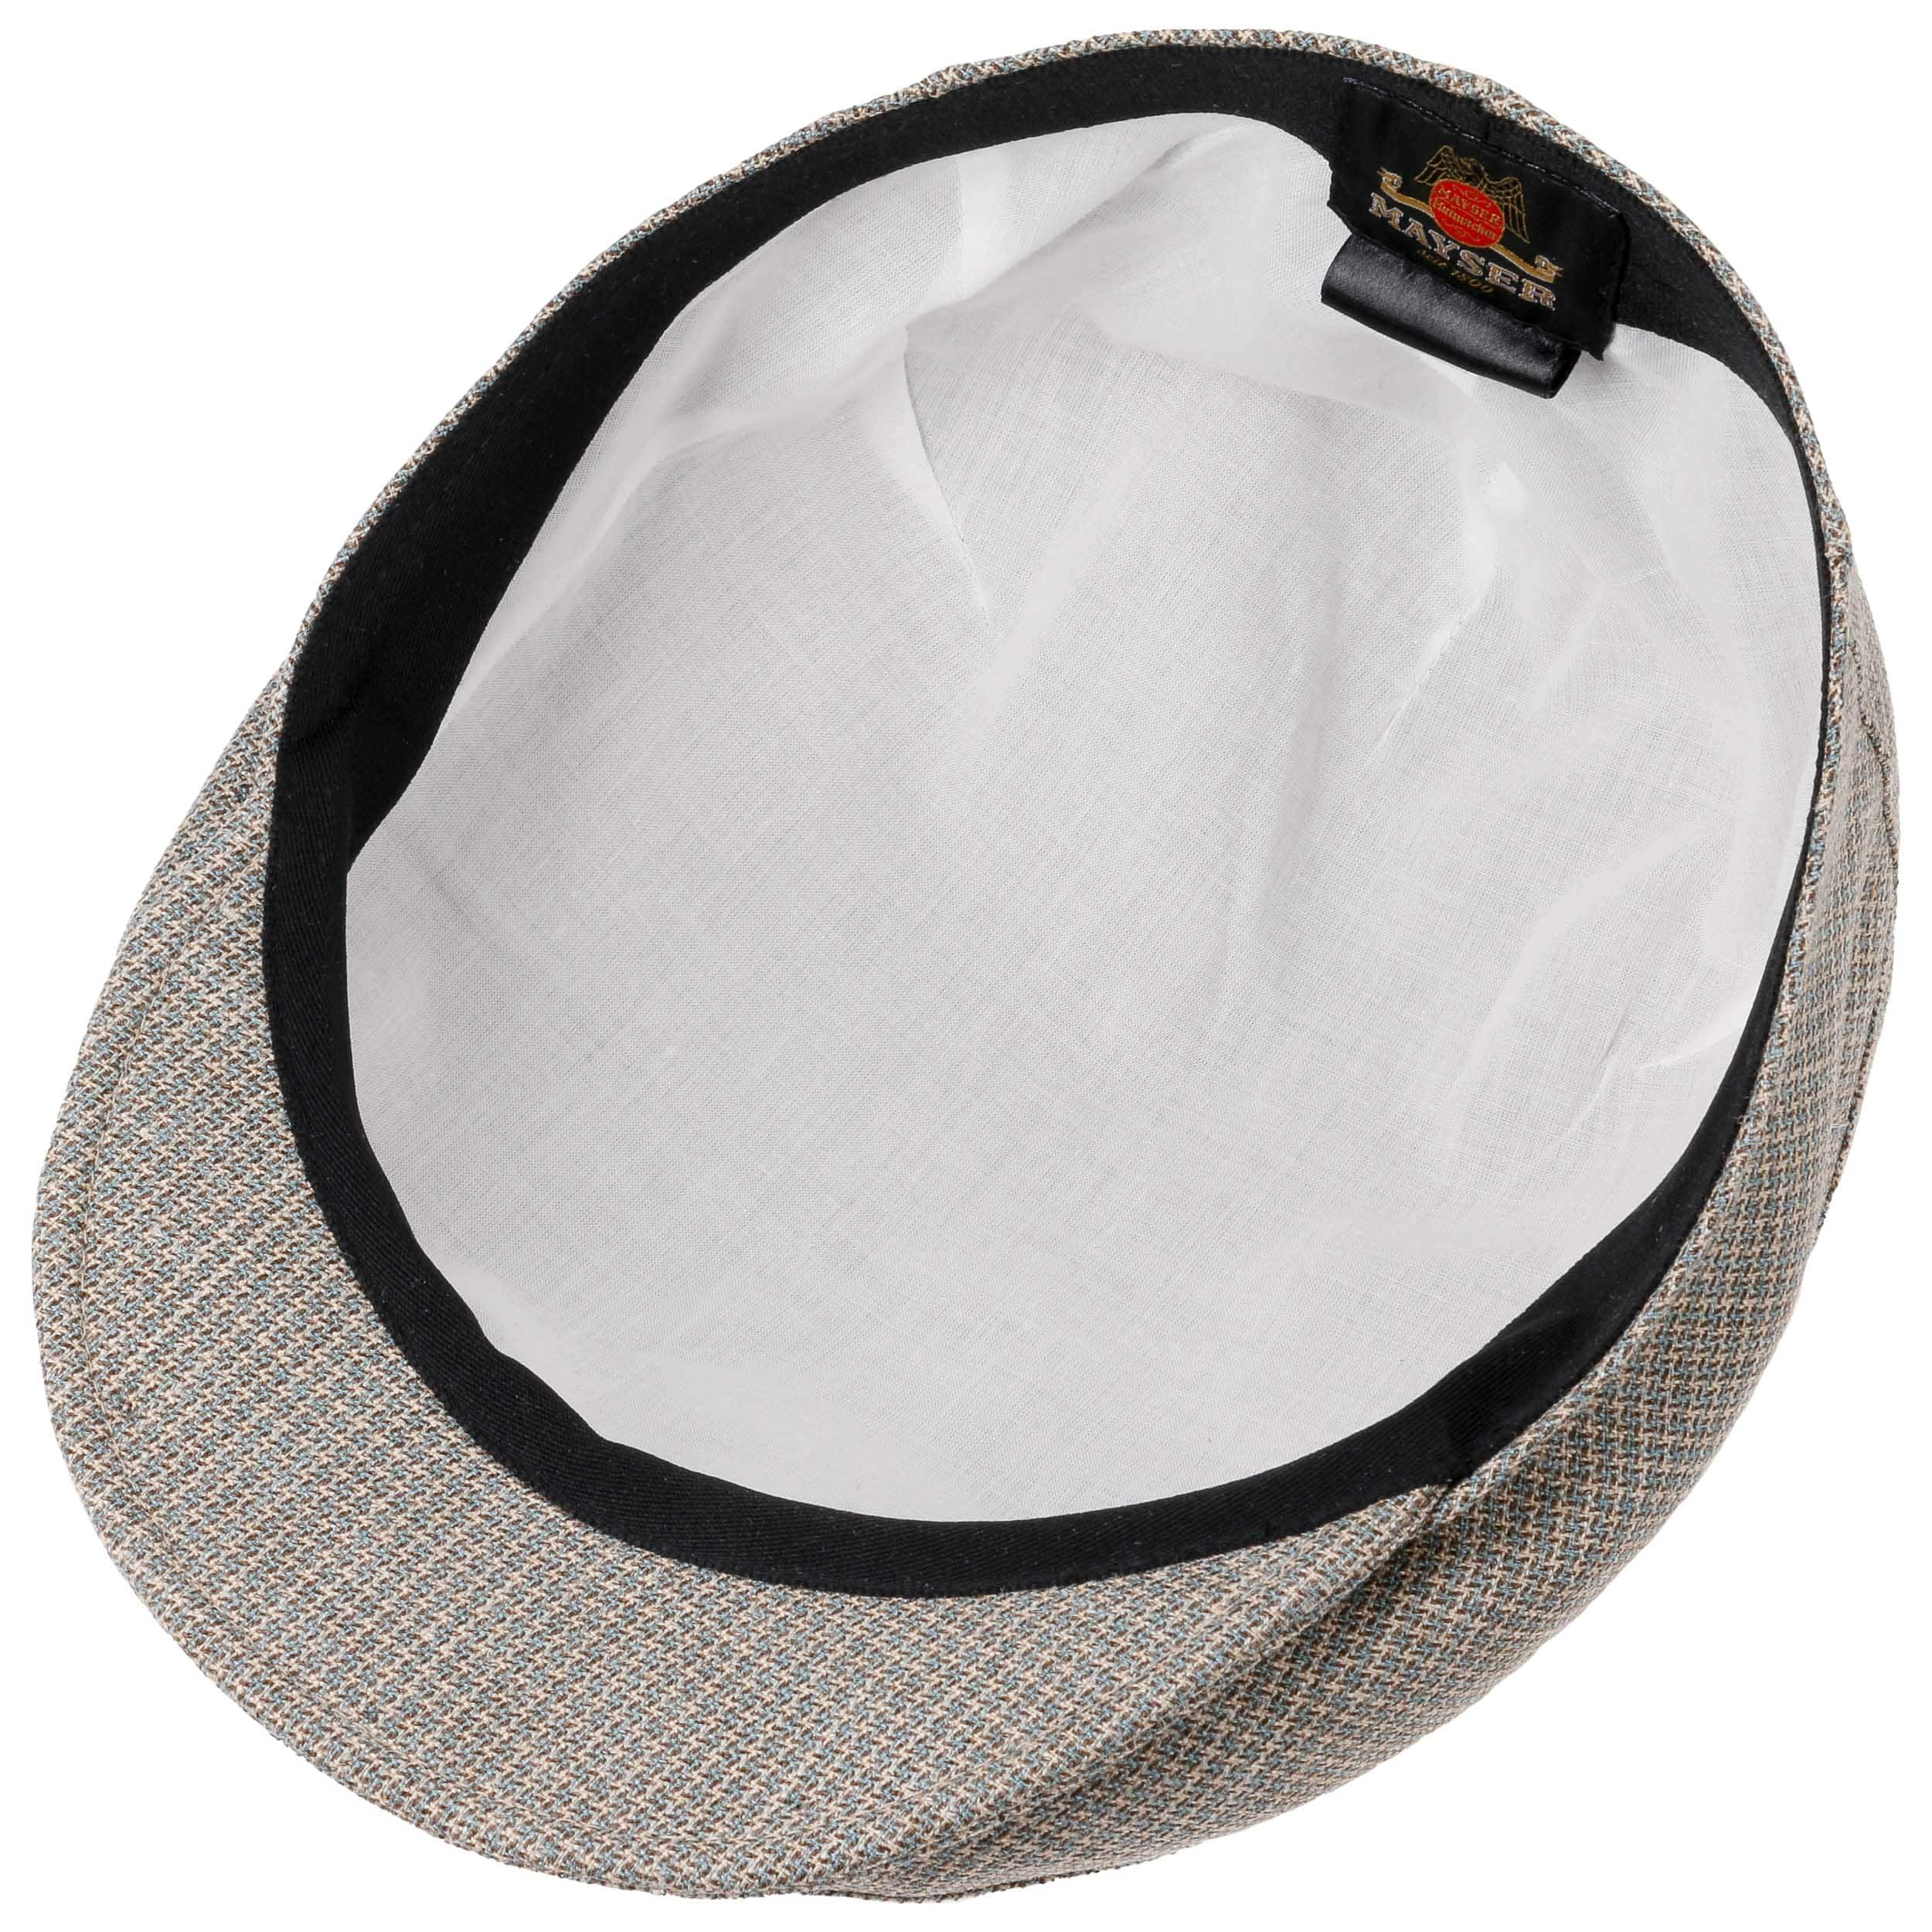 85d59028f3364 Gorra Vincent Soft Check by Mayser - Gorras - sombreroshop.es